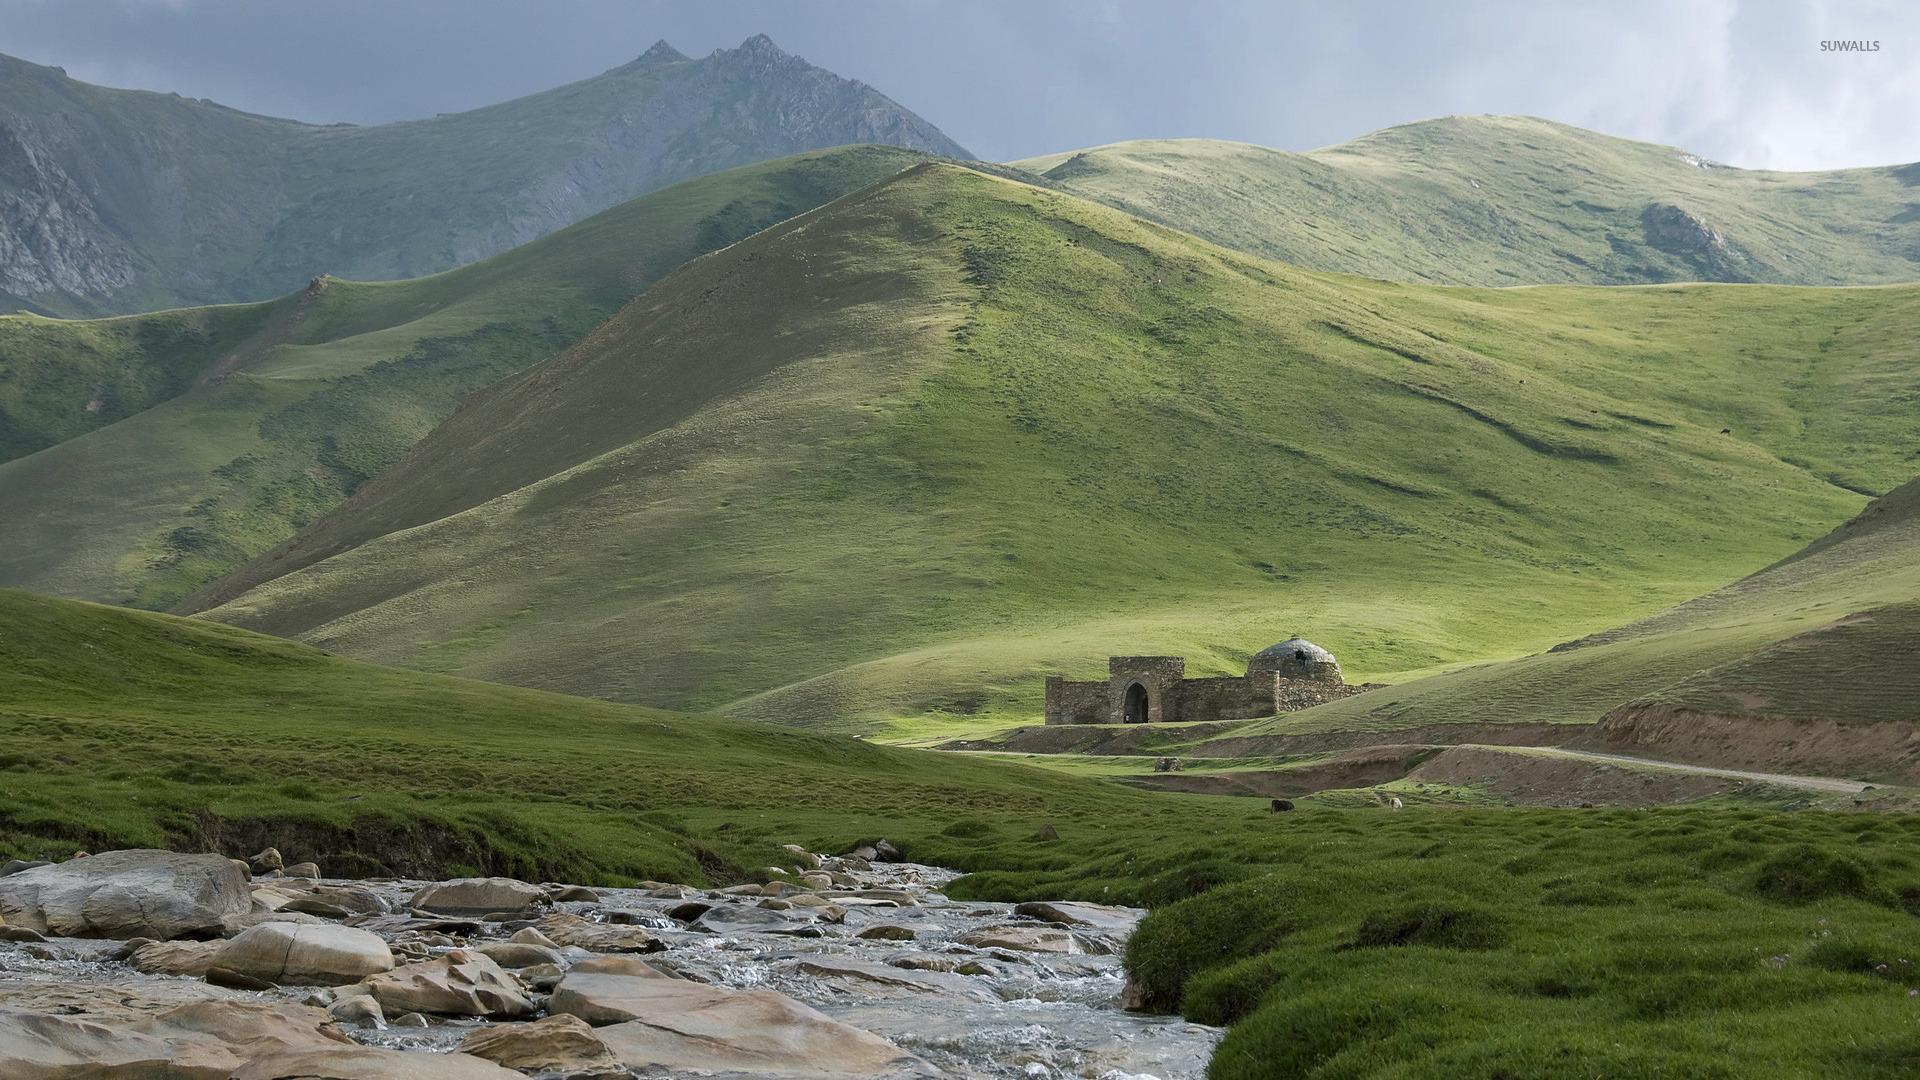 Bing Fall Desktop Wallpaper Caravansary On Silk Road In Kyrgyzstan Wallpaper Nature